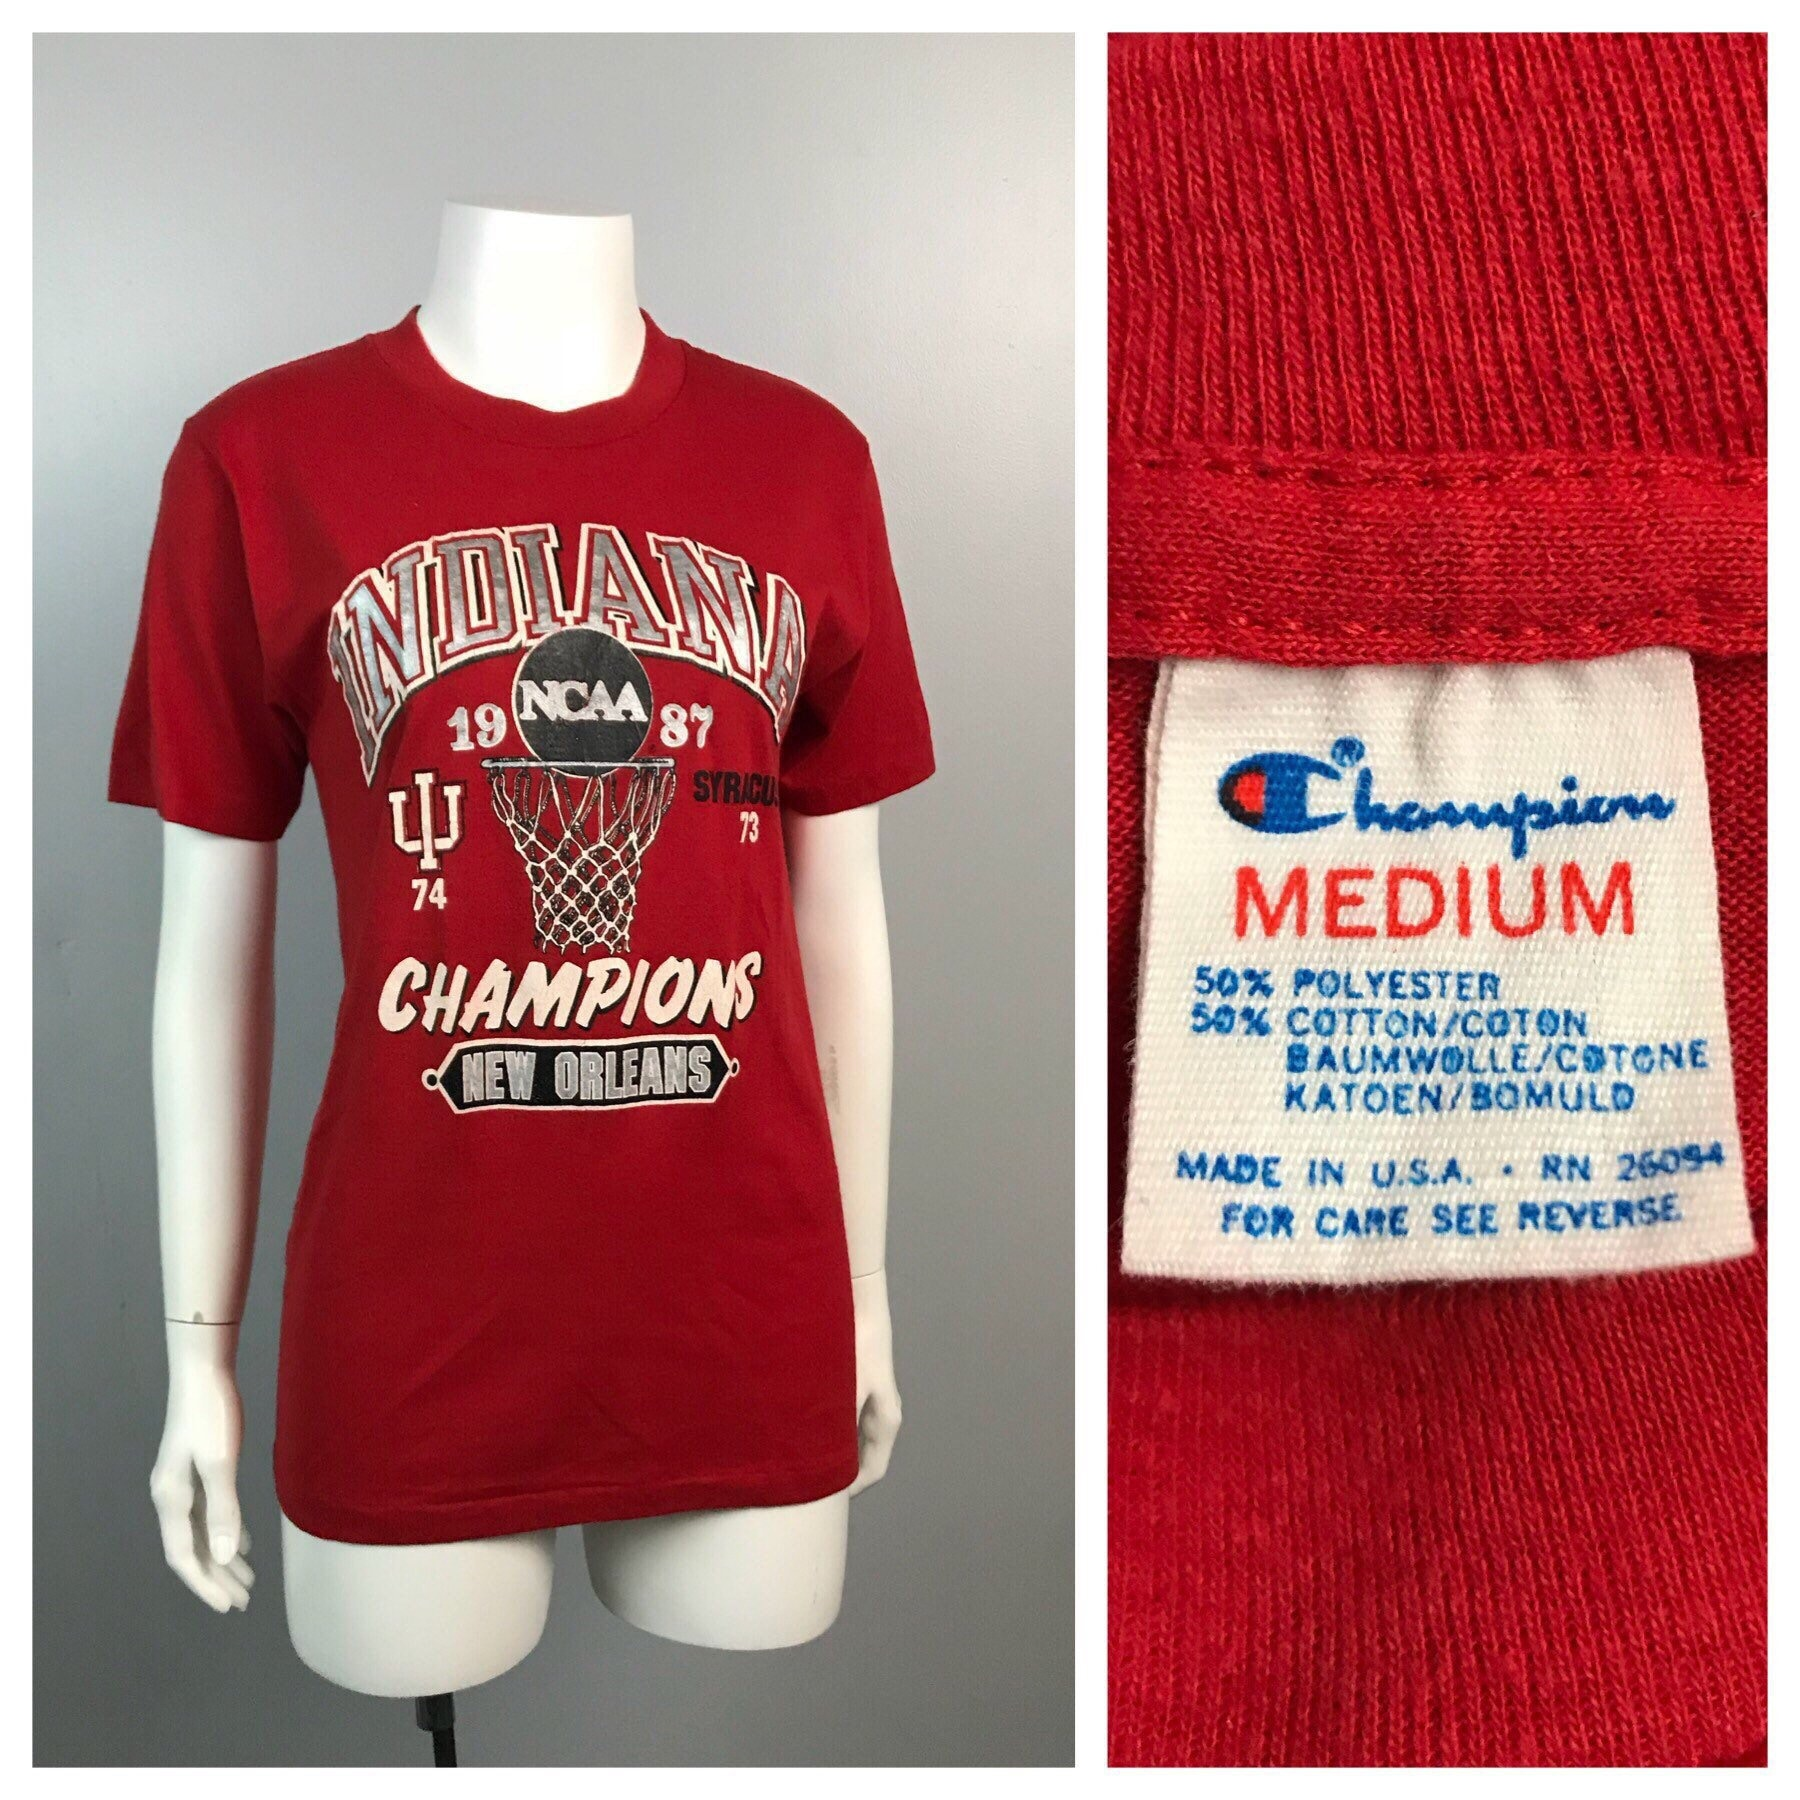 Vintage 1980s Threadbare Indiana Hoosiers Basketball 87 Champions T Shirt Womens Small 80s Retro Champion Iu Graphic Cotton Tee Unisex Tshirt